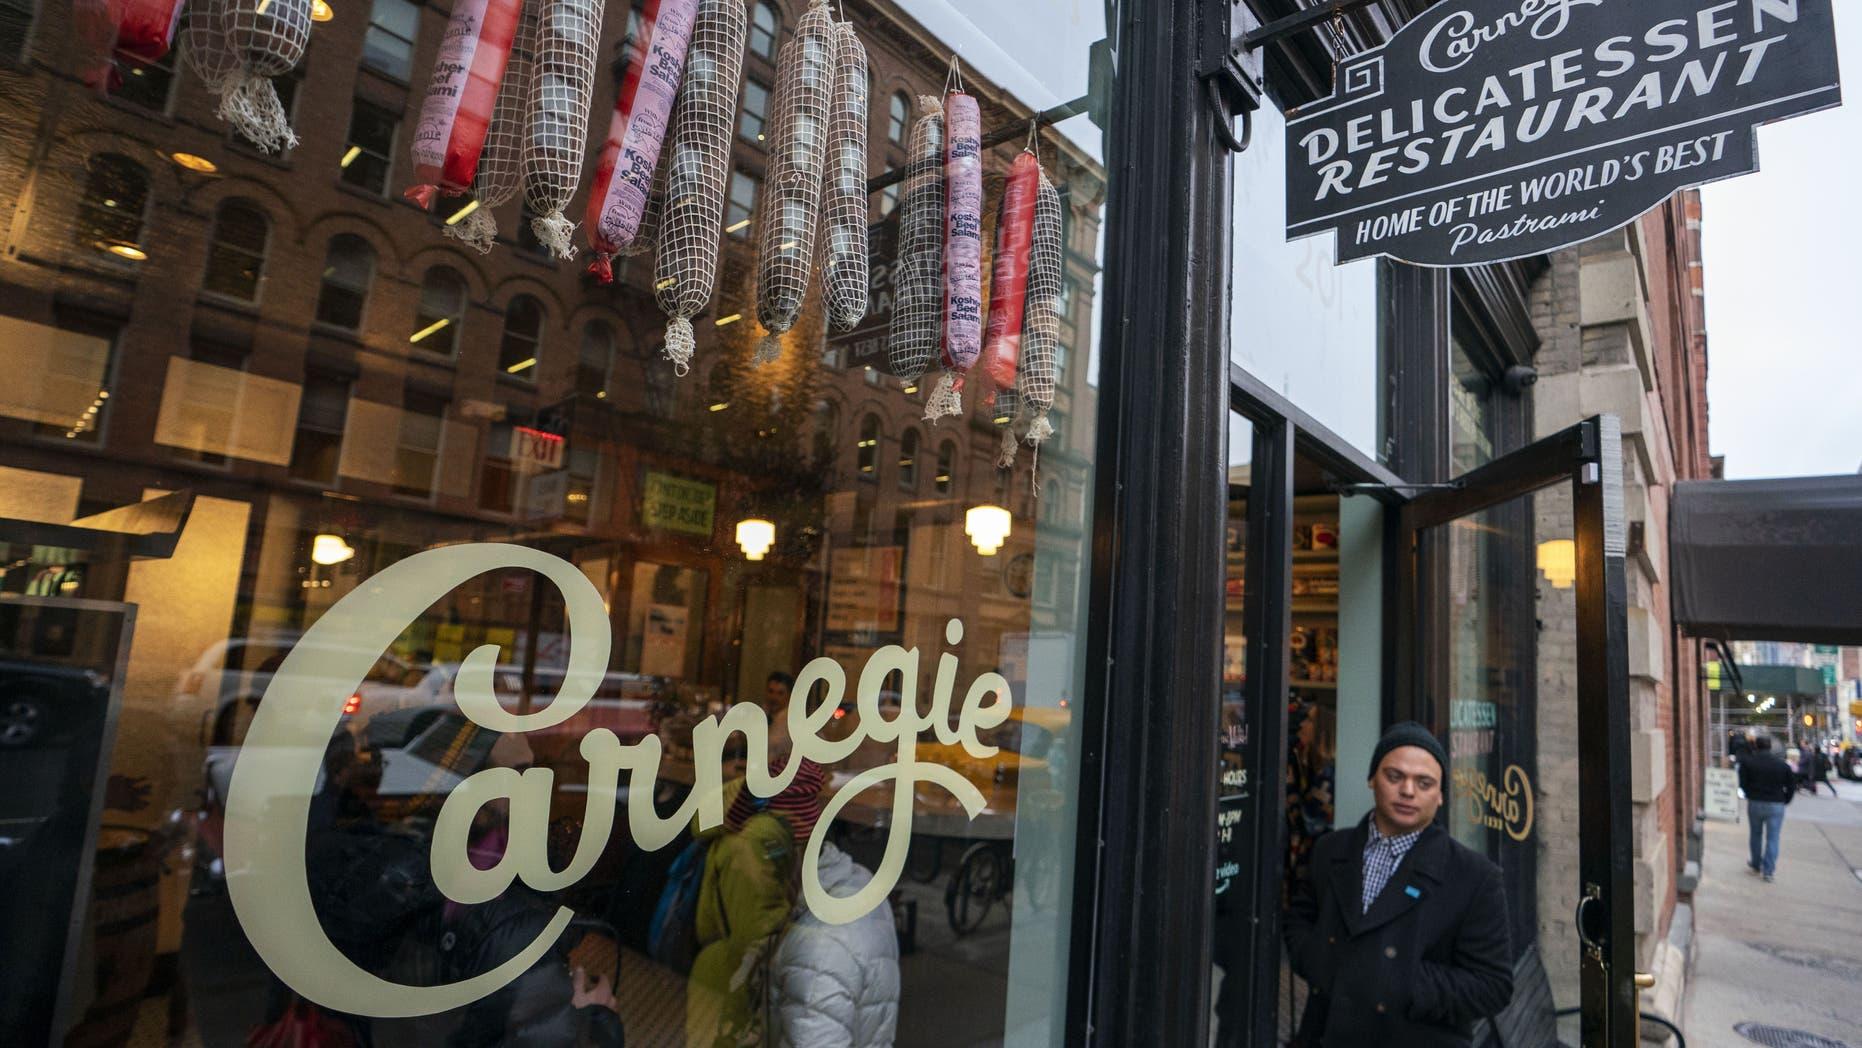 The pop-up location, located in Manhattan's Nolita neighborhood, is running through Saturday.